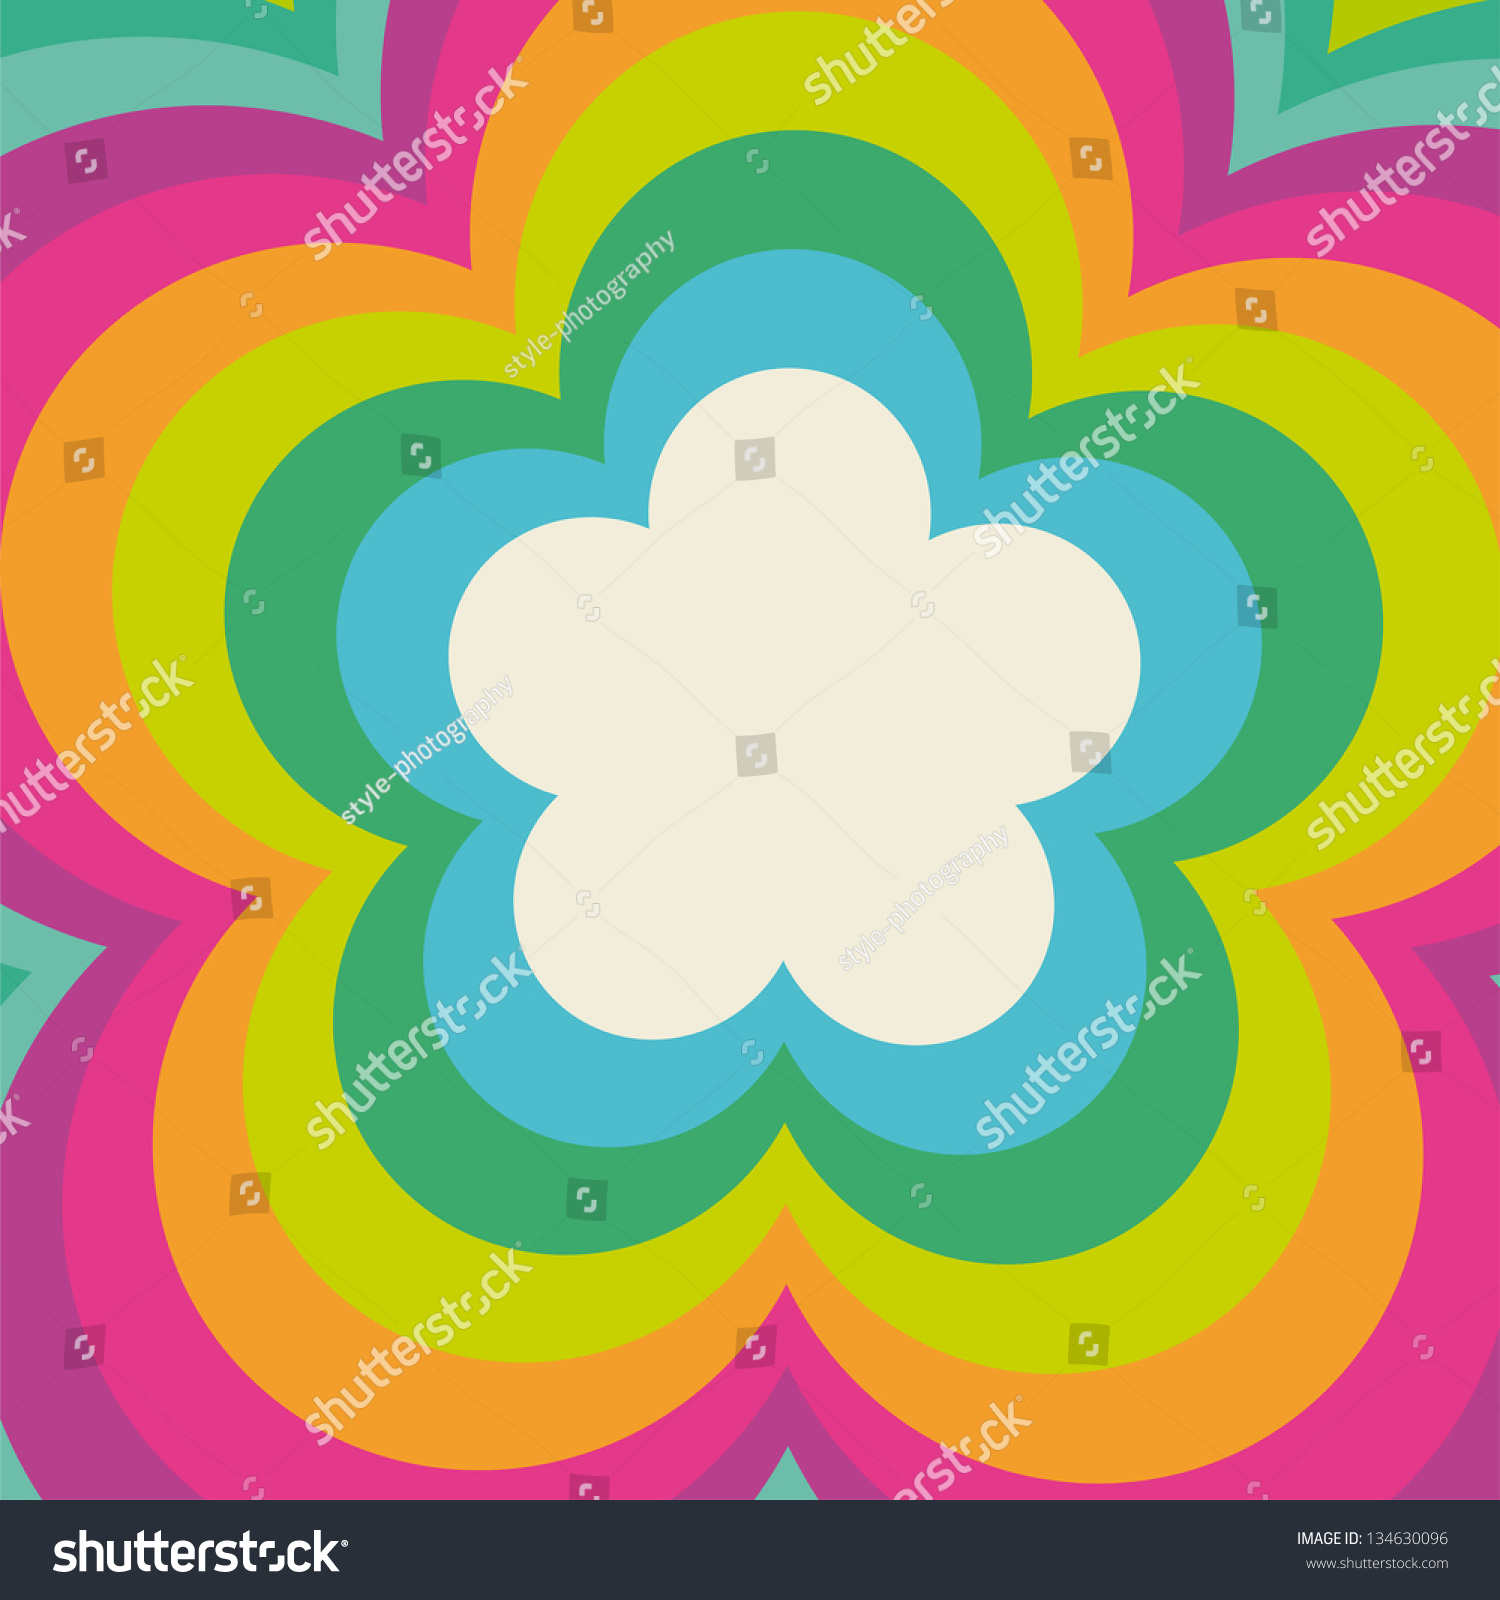 rainbow flower power cover design stock vector 134630096 shutterstock. Black Bedroom Furniture Sets. Home Design Ideas